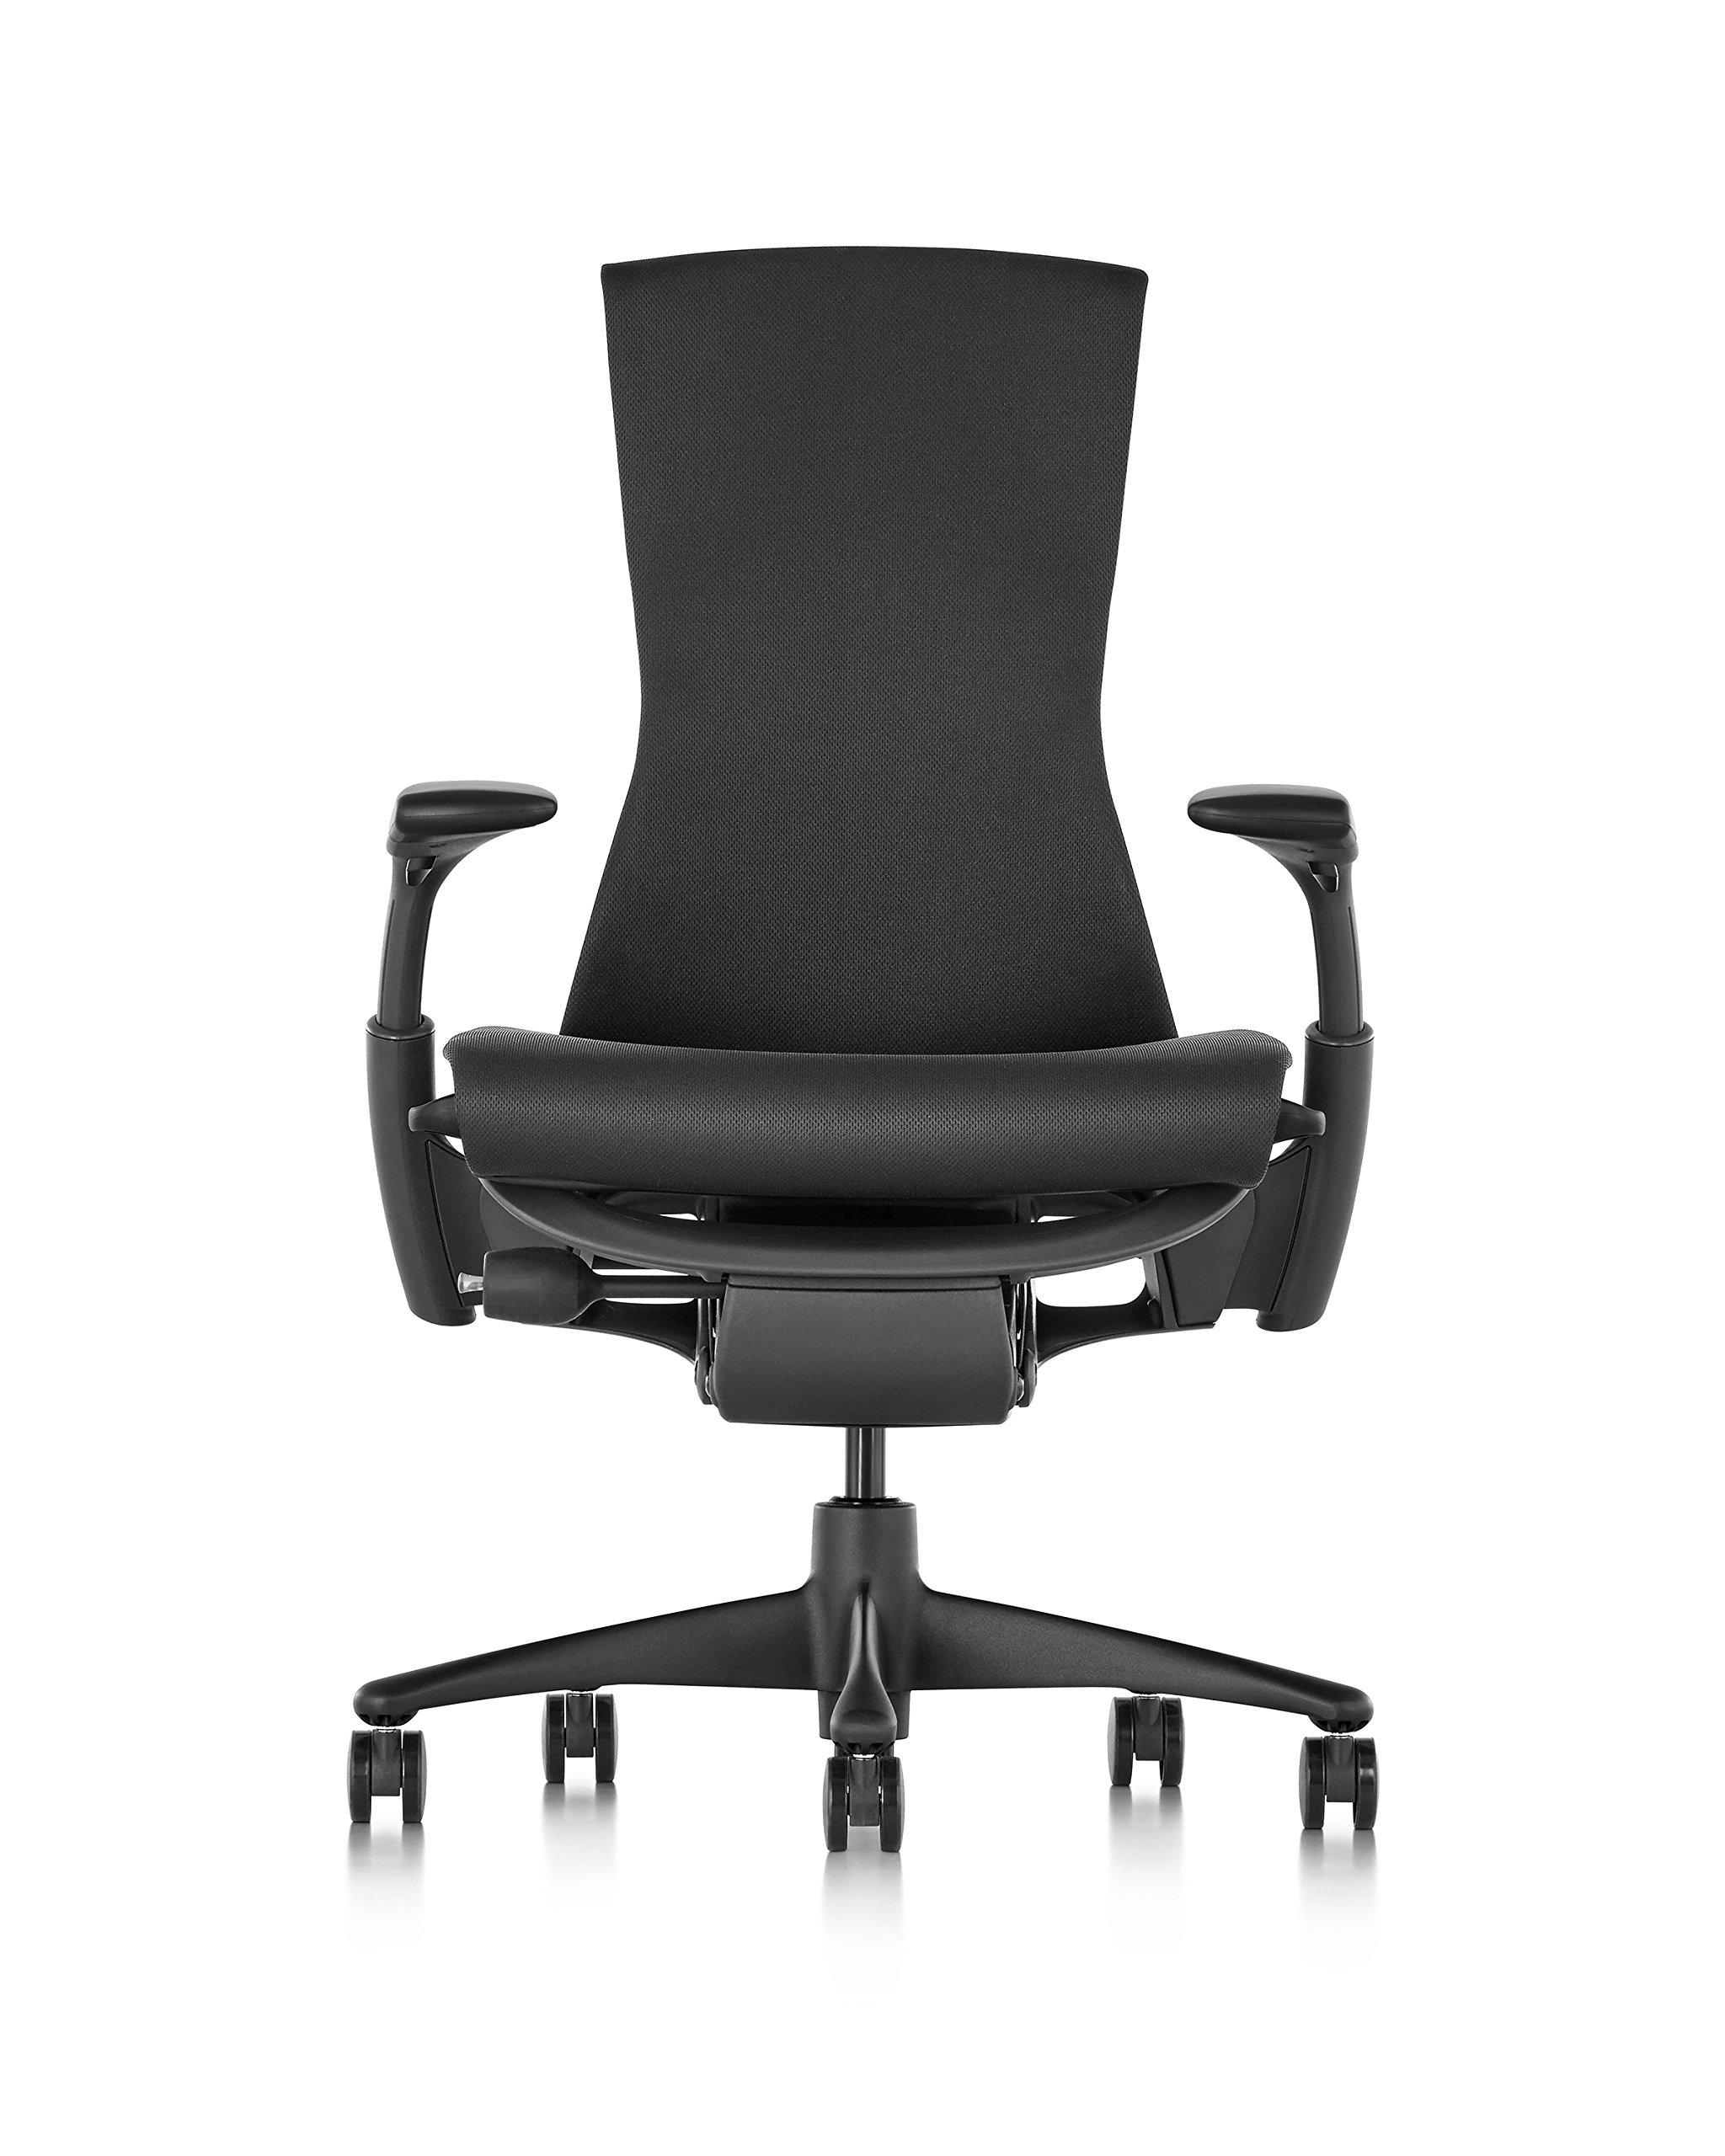 Herman Miller Embody Chair - Graphite Frame/Black Rhythm Textile , Graphite/Black Rhythm - CN122AWAAG1G1BB3014 by Herman Miller